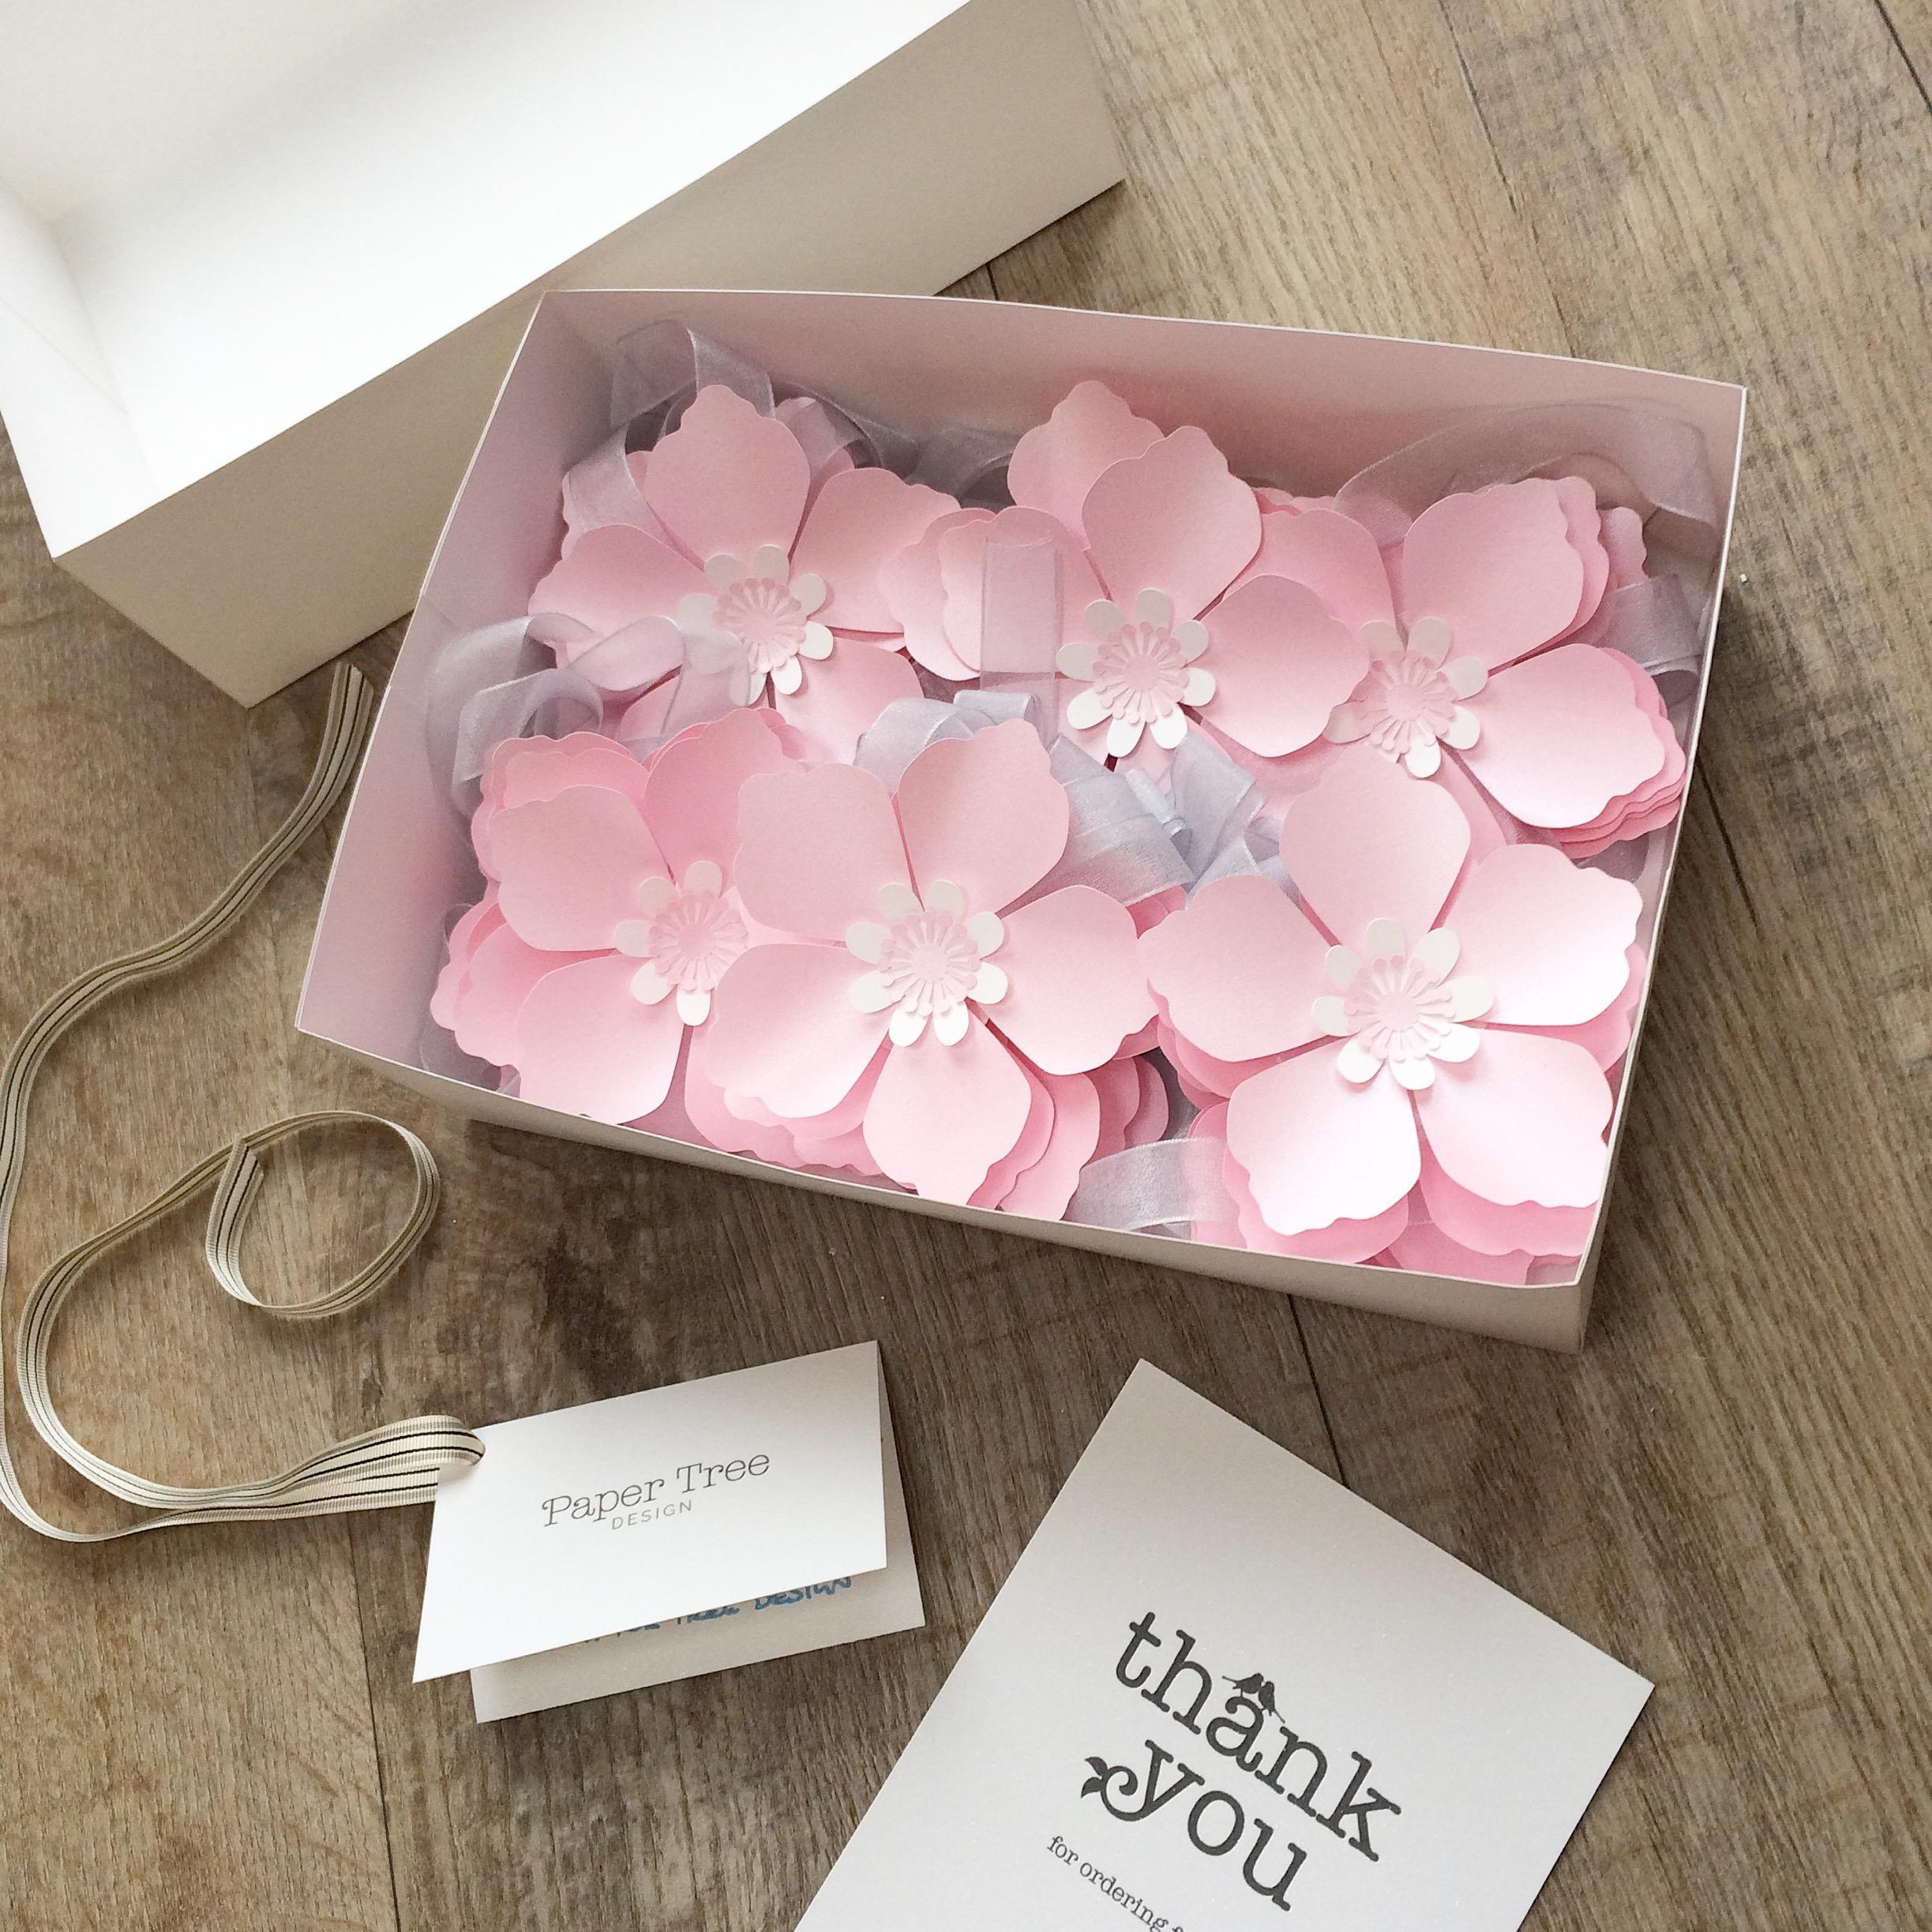 Cherry blossom paper flower garland